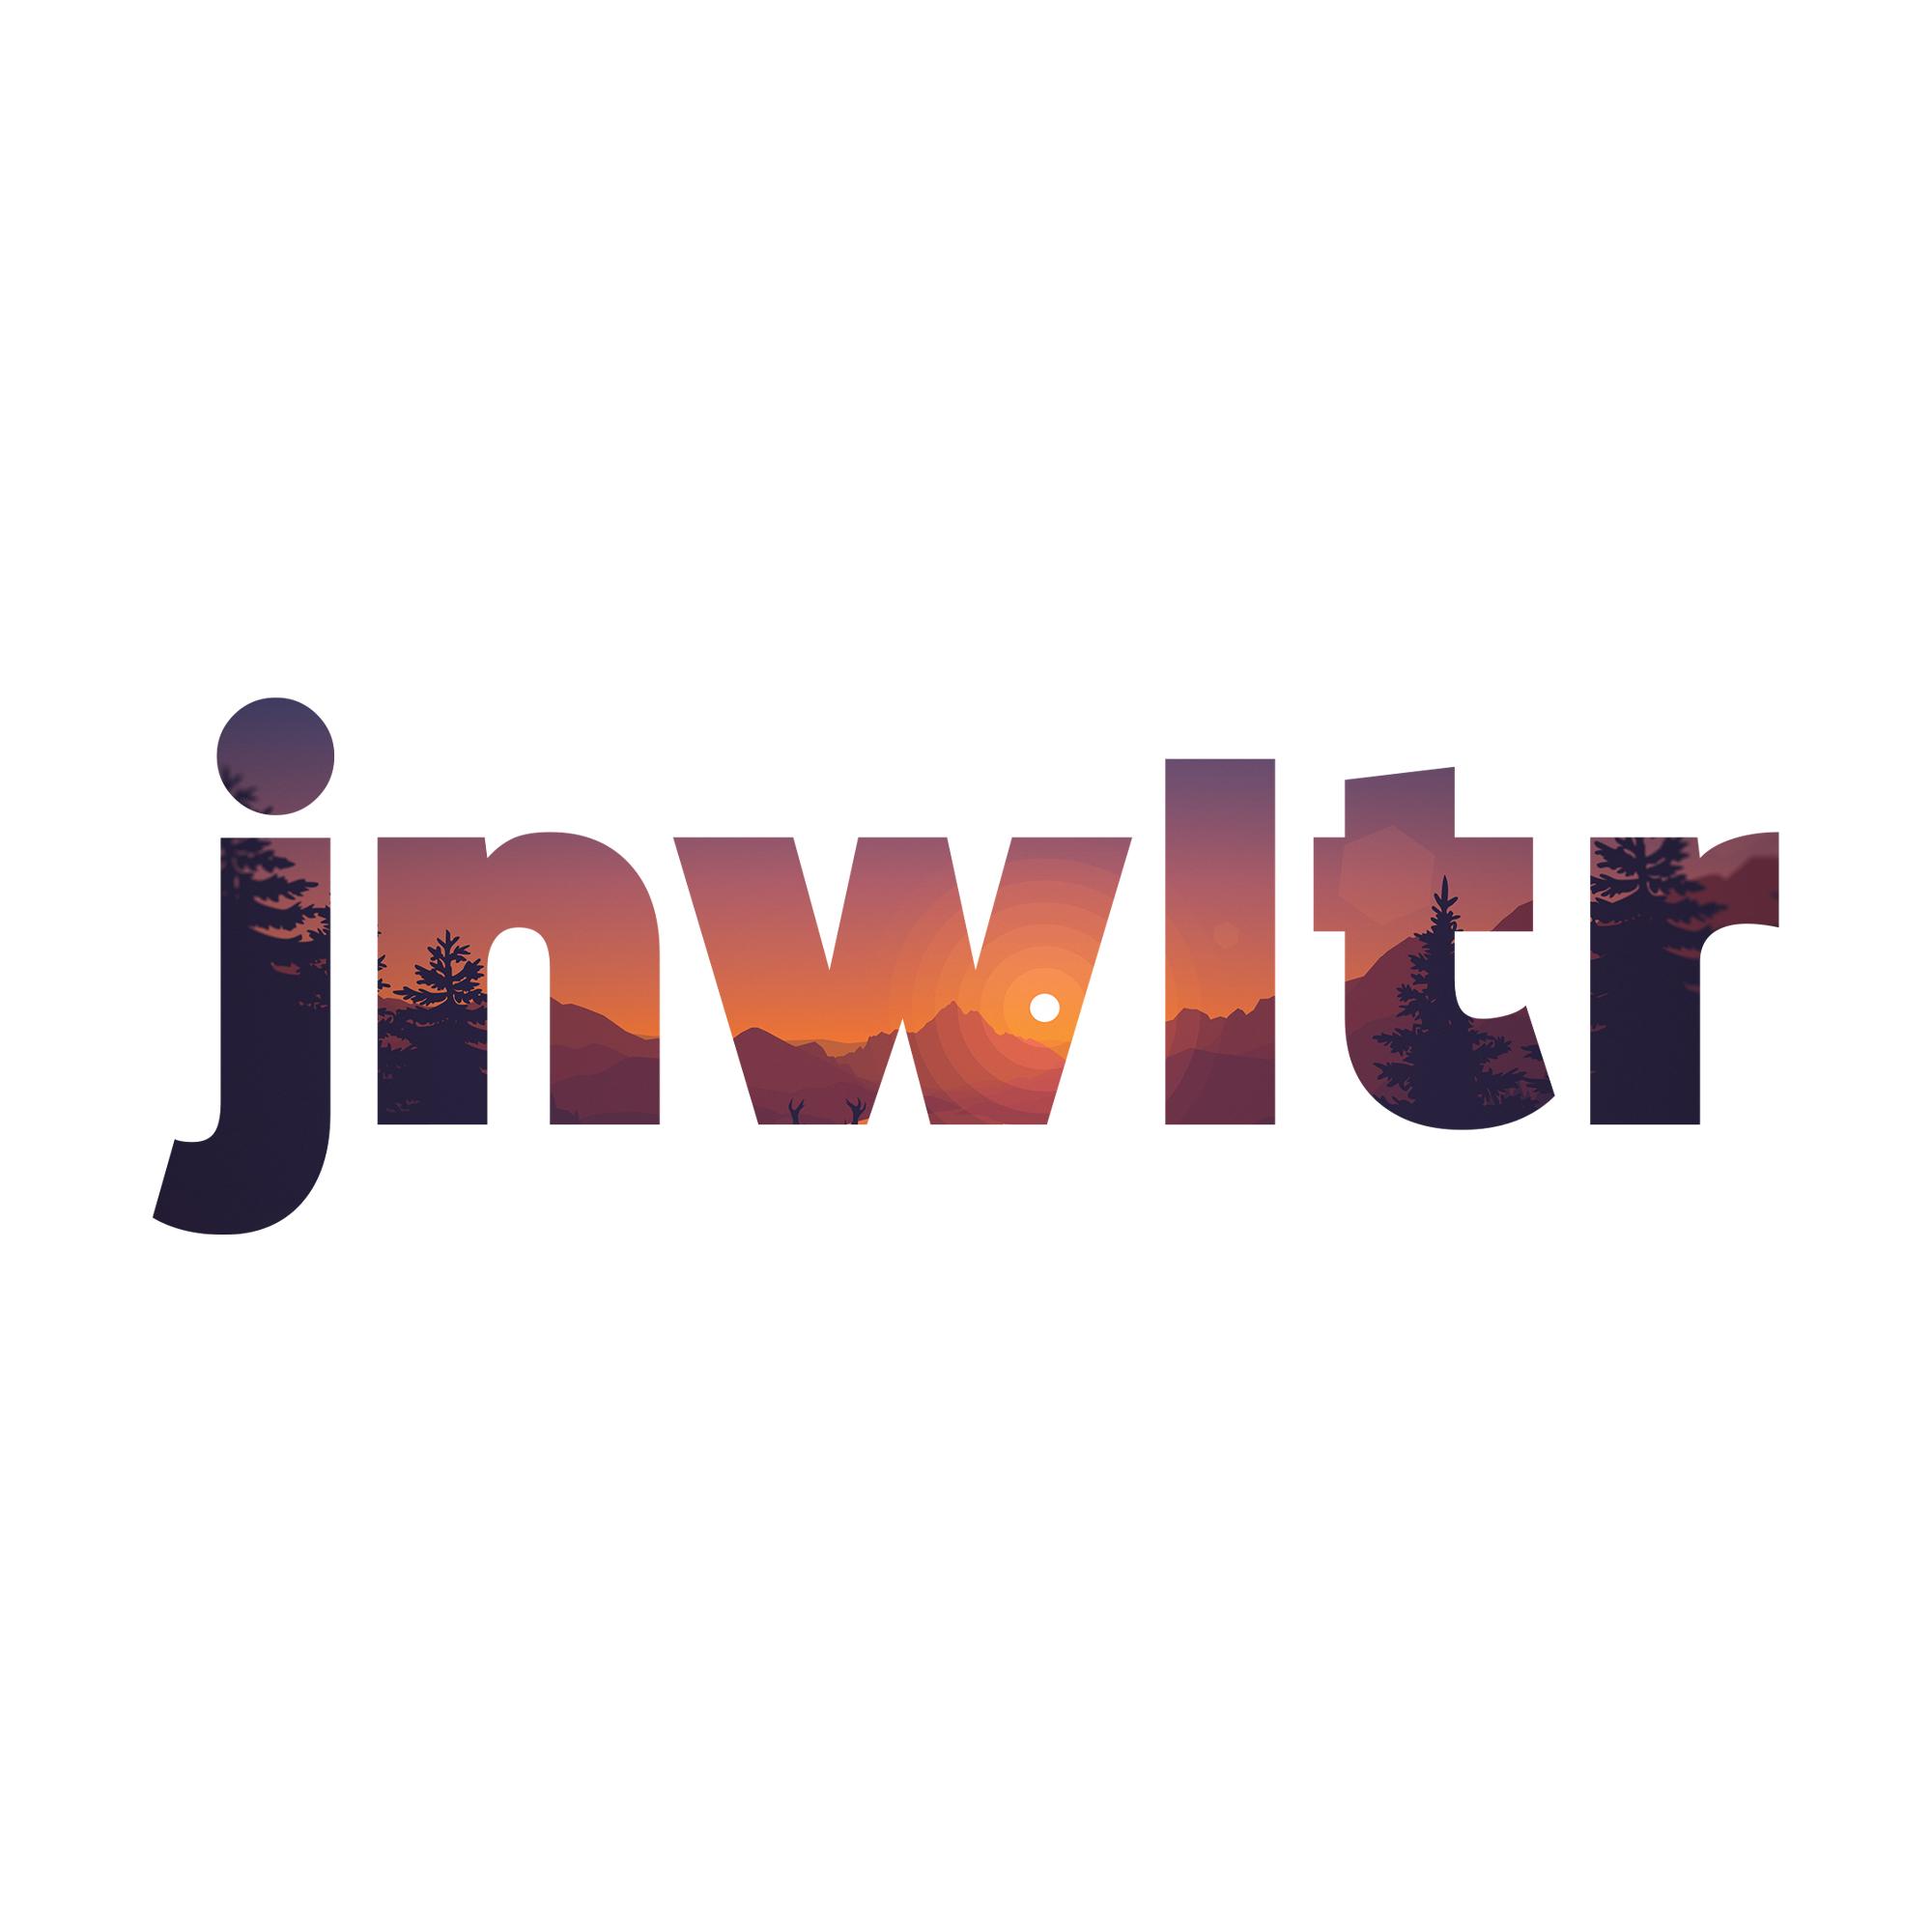 Go to Jan Walter Luigi's profile